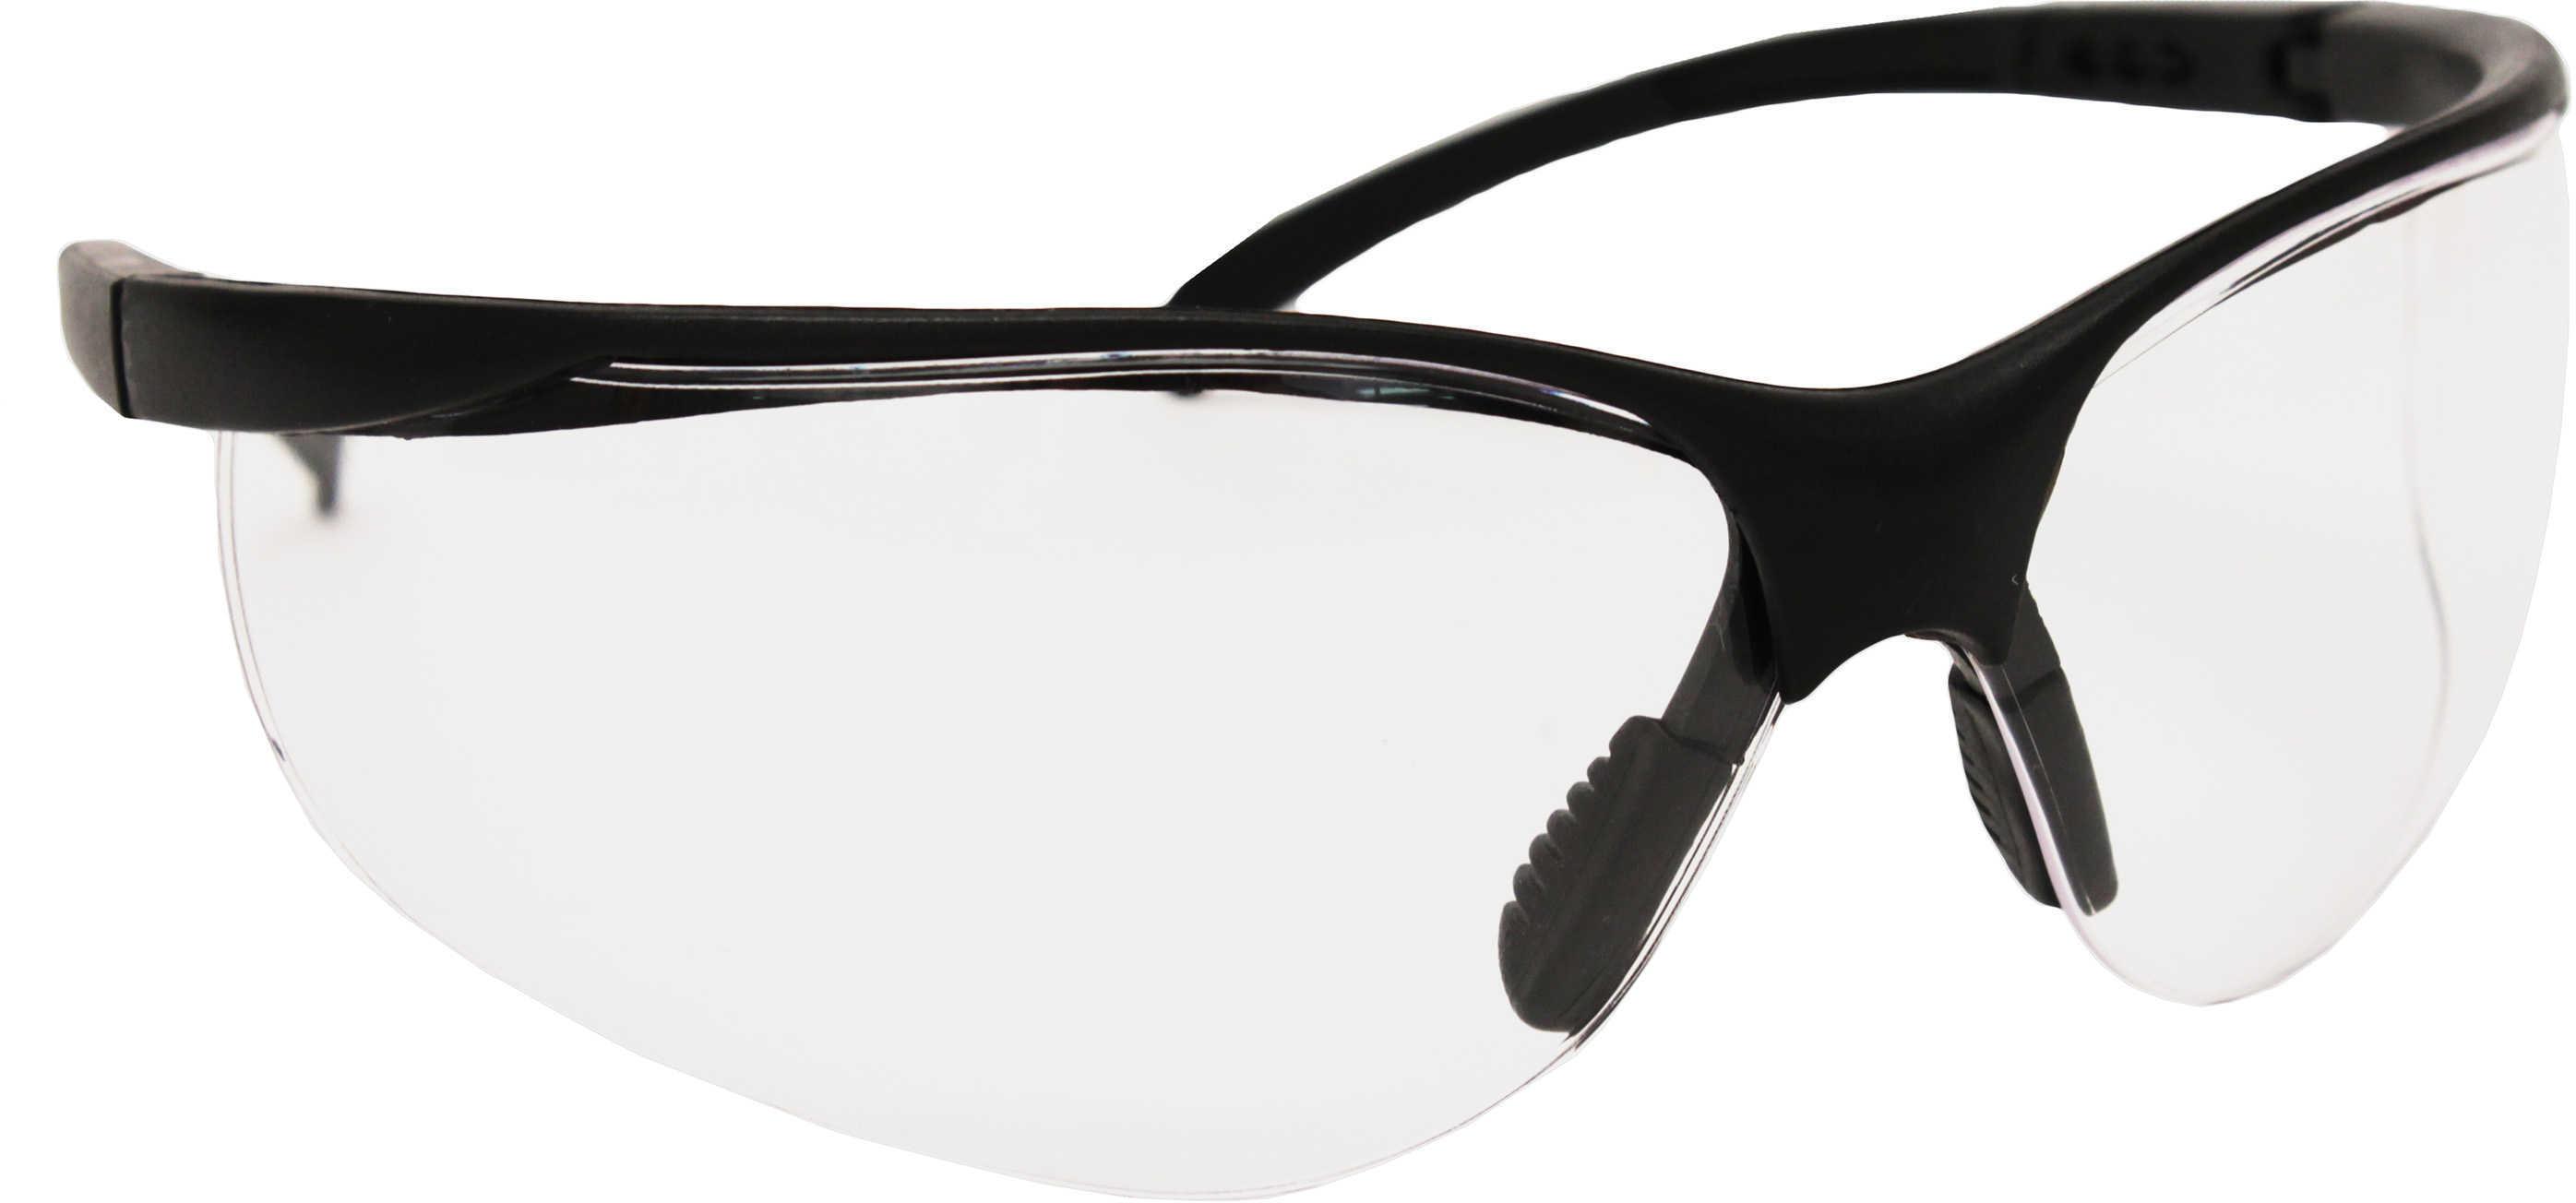 Caldwell Pro Range Glasses, Clear Md: 320040